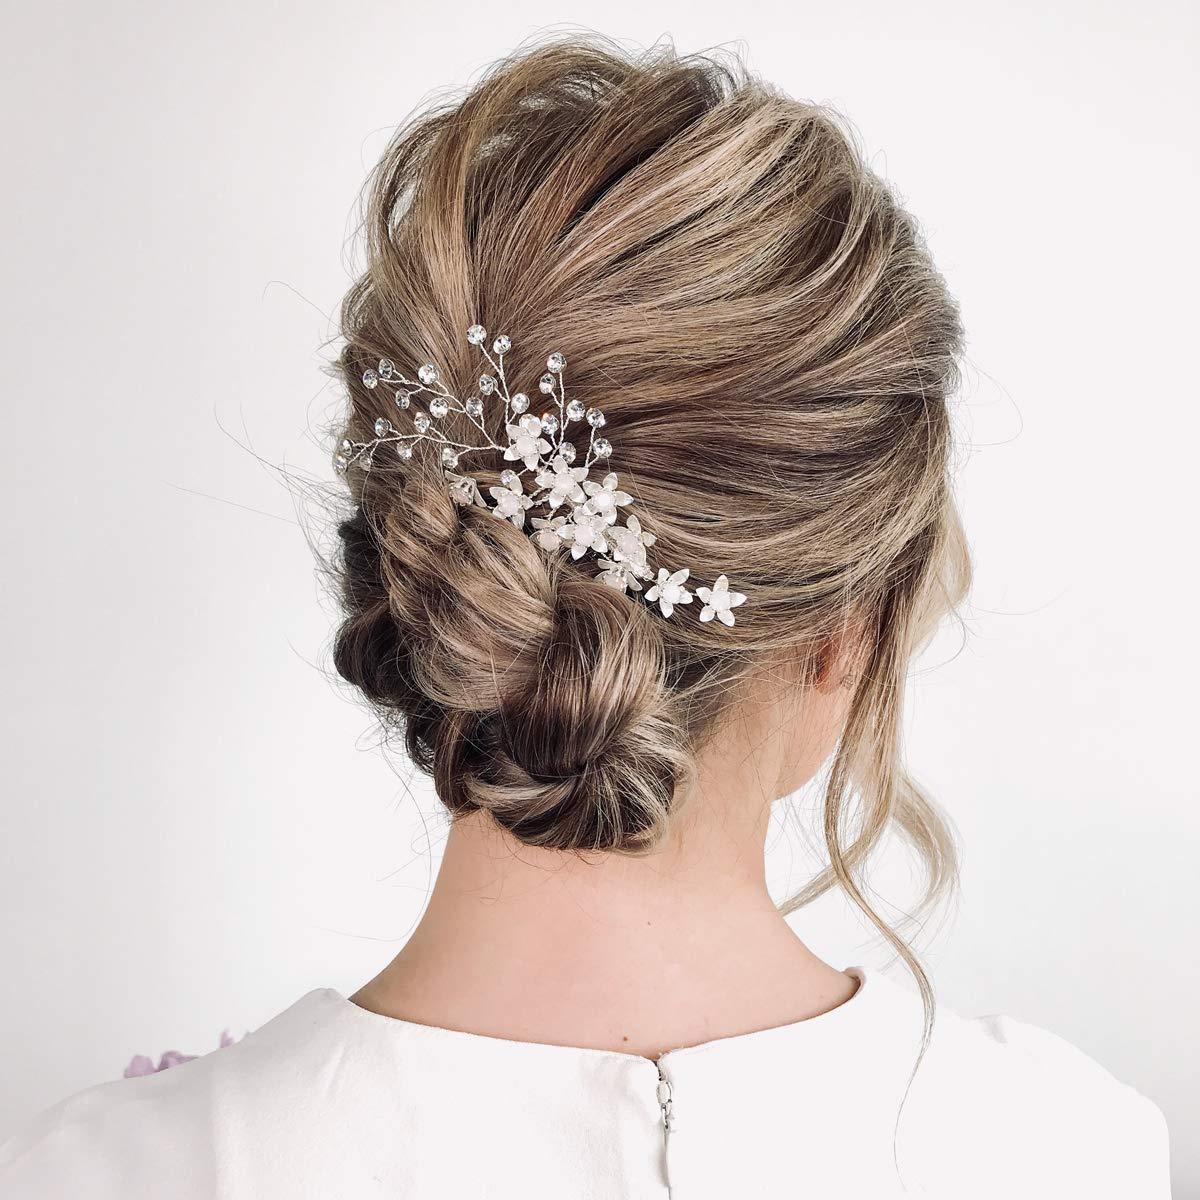 SWEETV Rhinestone Wedding Hair Comb,Silver Wedding Hair Clip,Bridal Hair Accessories for Wedding